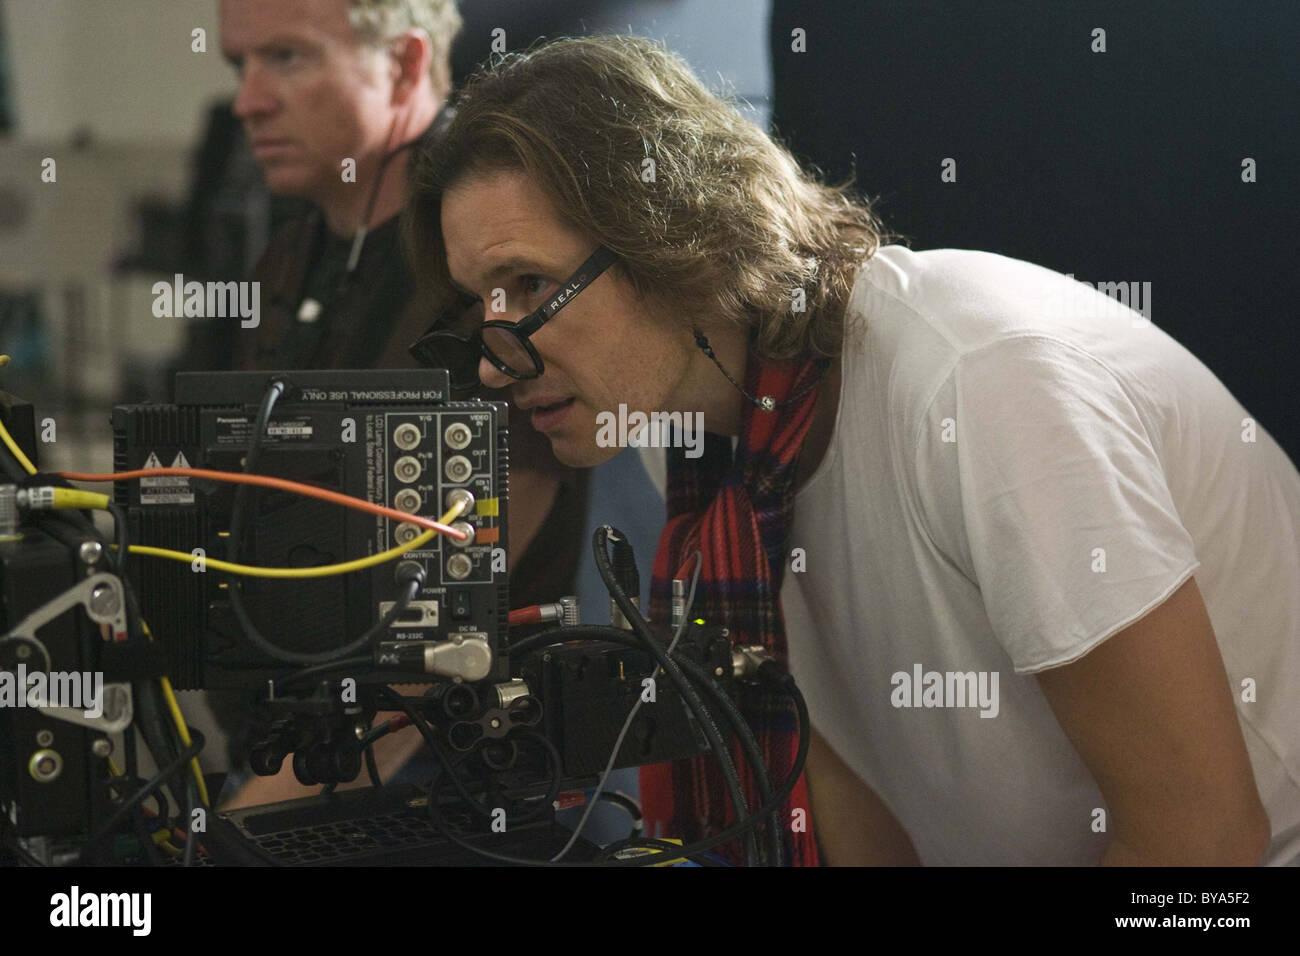 Resident Evil: Afterlife Año : 2010 USA / Director Británico : Paul W.S. Anderson Paul W.S. Anderson imágenes Imagen De Stock